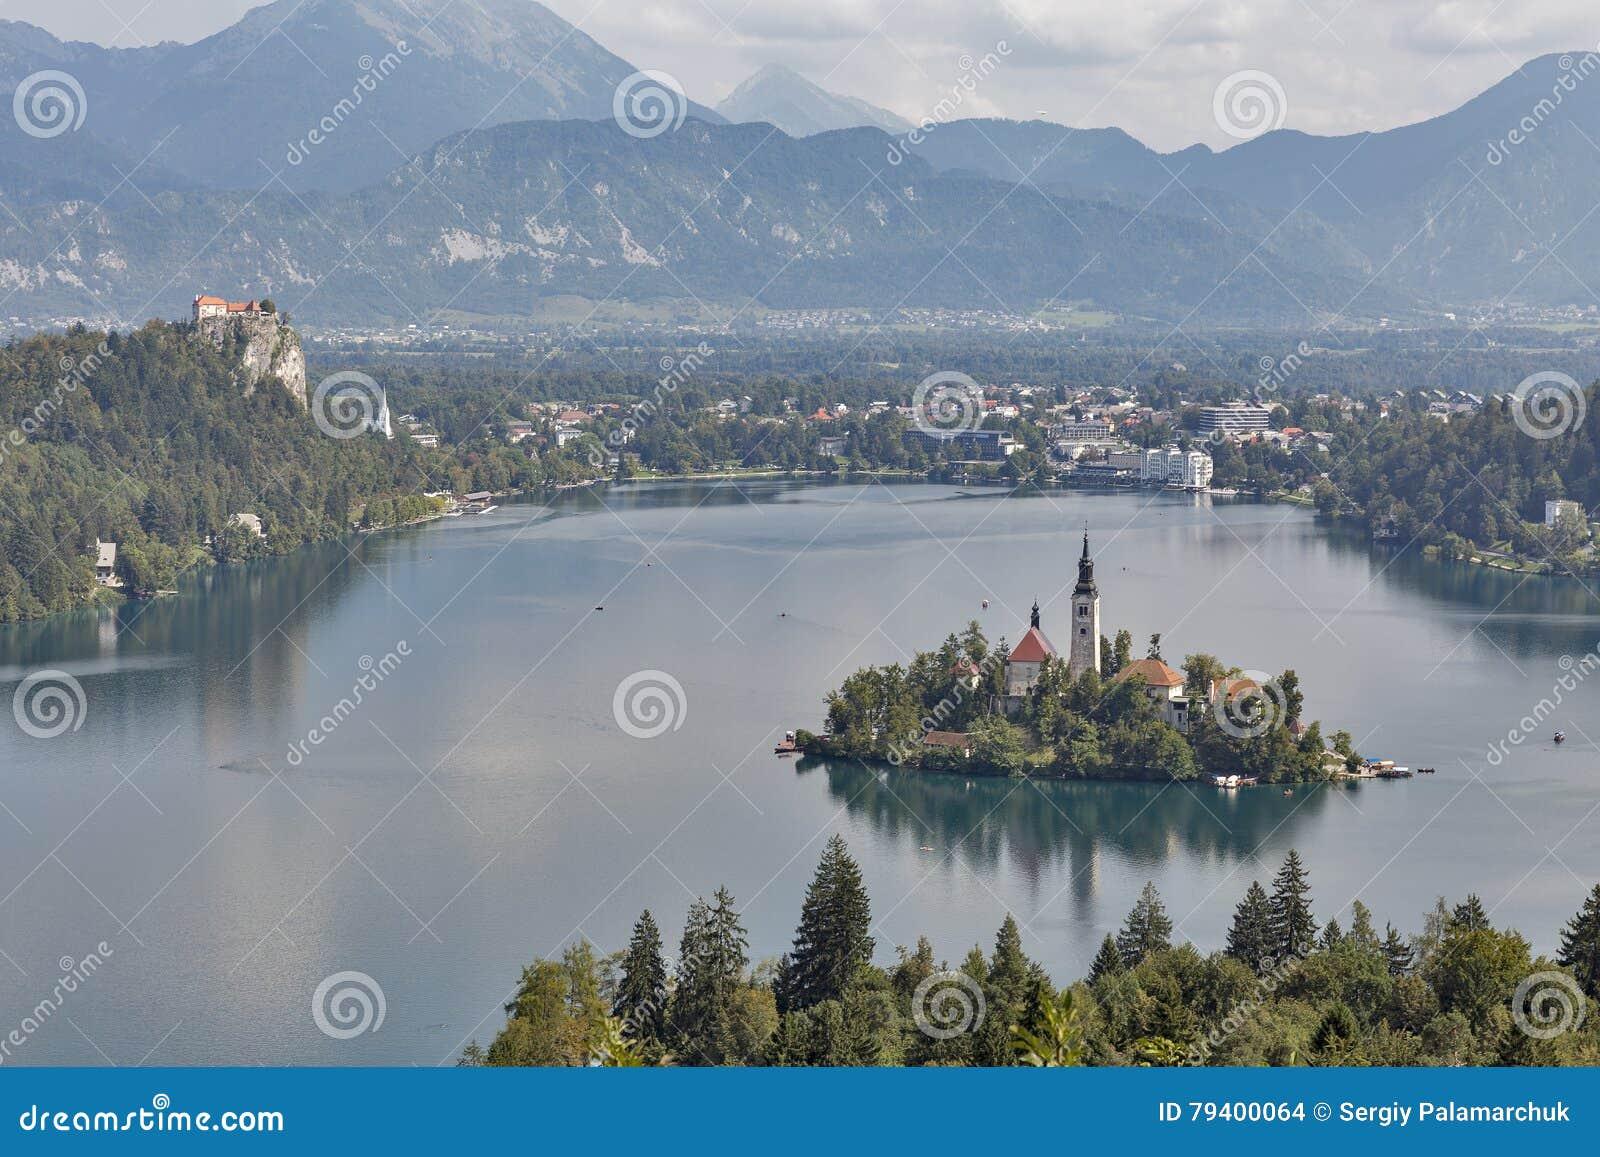 lake-bled-above-view-slovenia-panoramic-mountain-osojnica-79400064.jpg